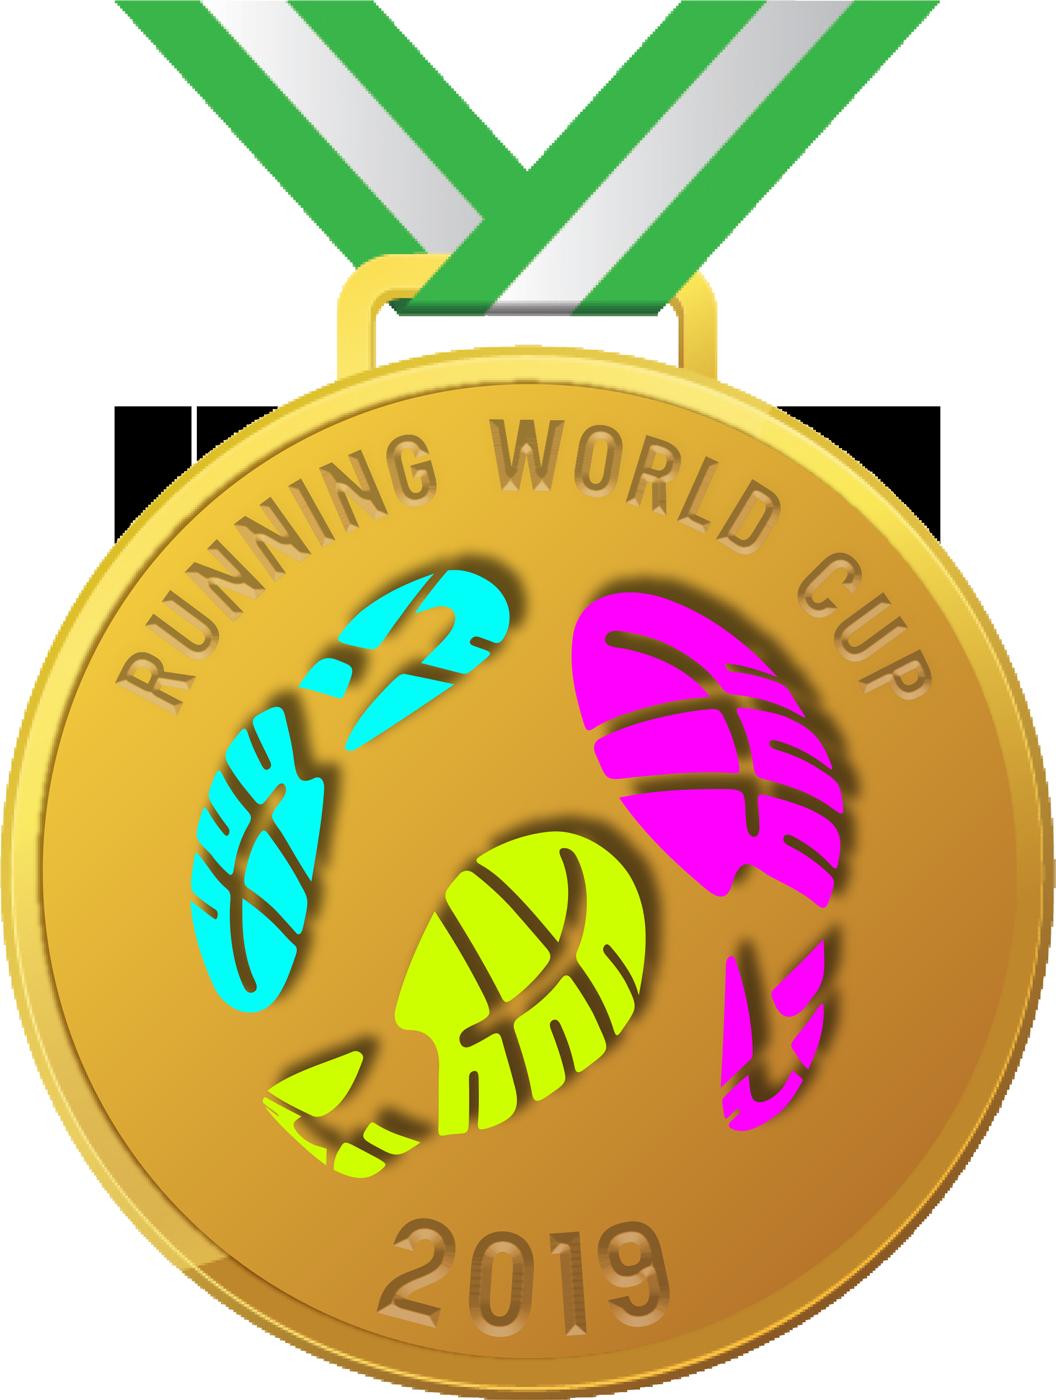 Running World Cup Mass Participation Gold Medal